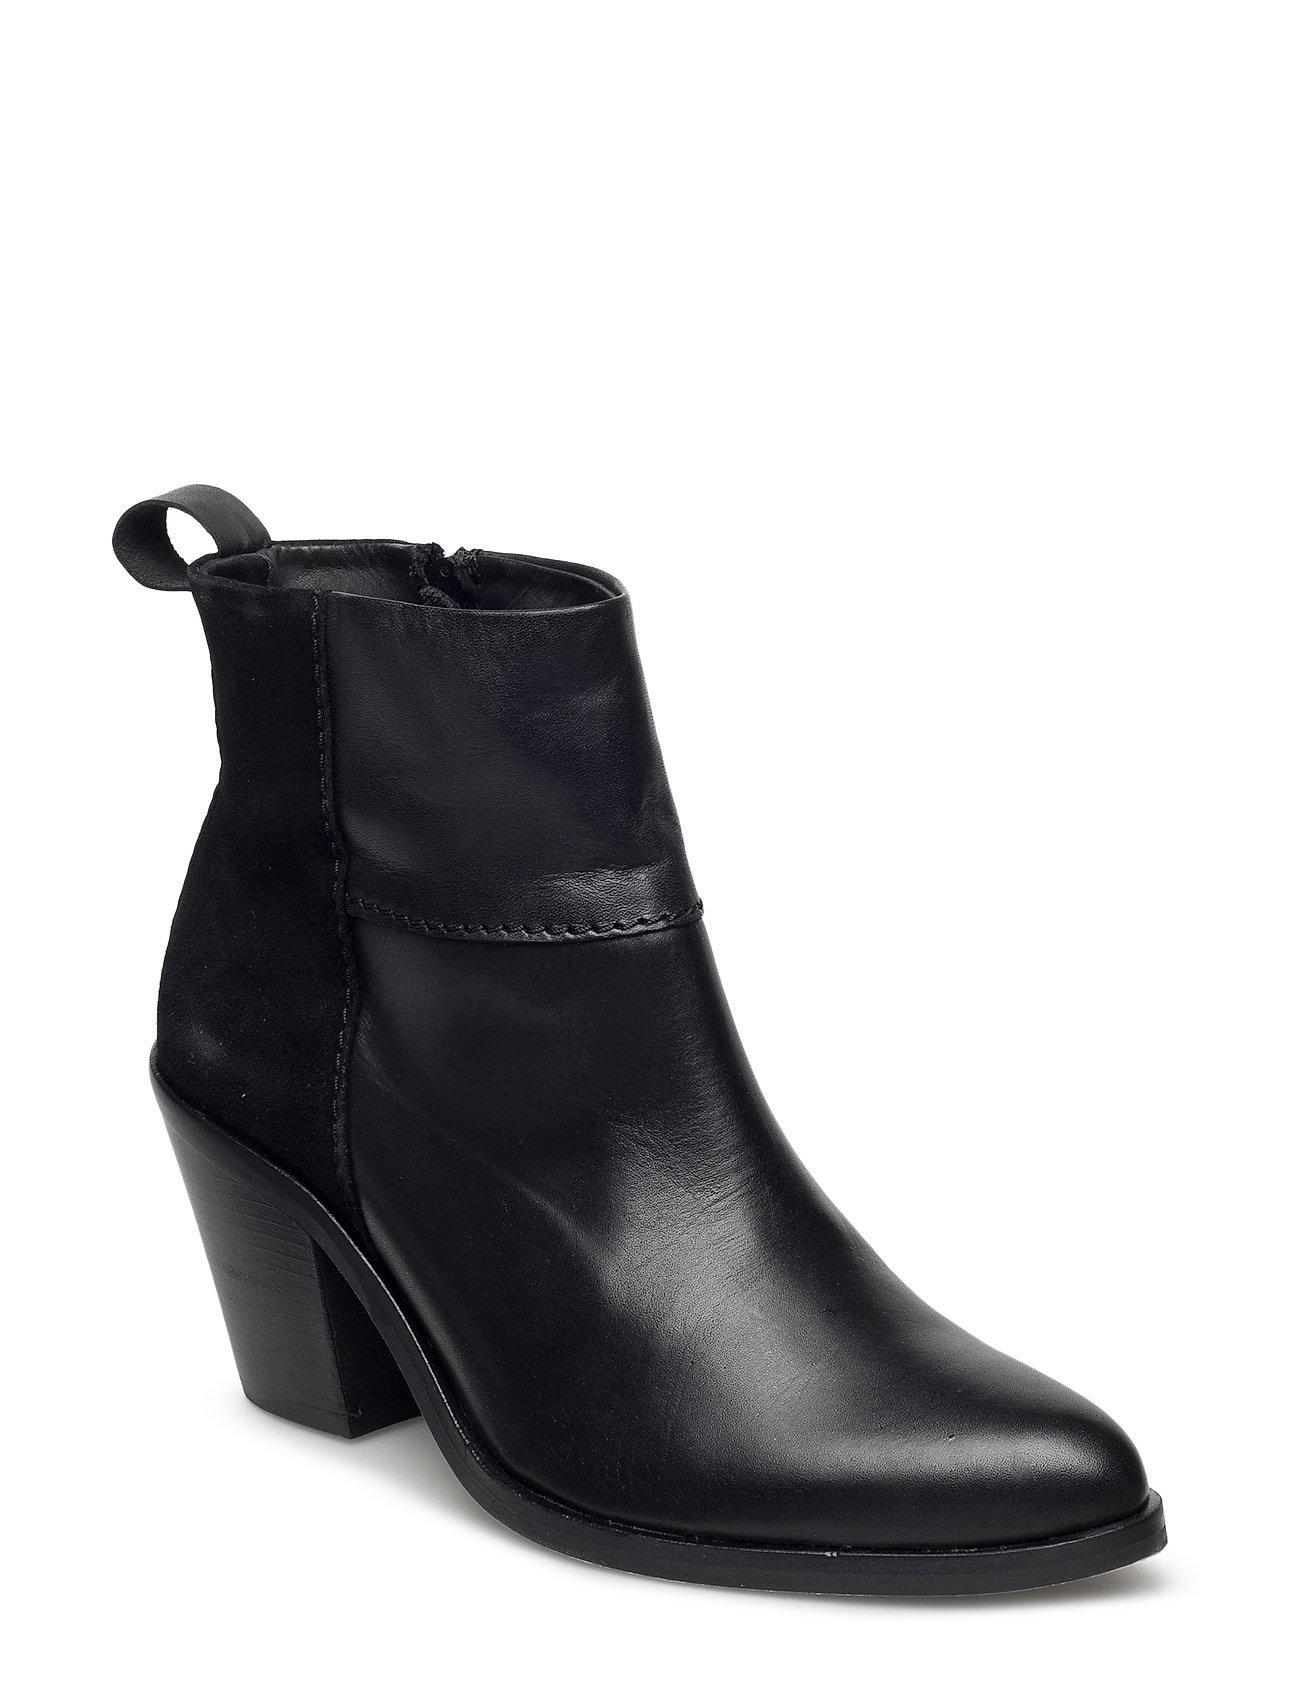 Nevada Boots Twist & Tango Støvler til Damer i Sort